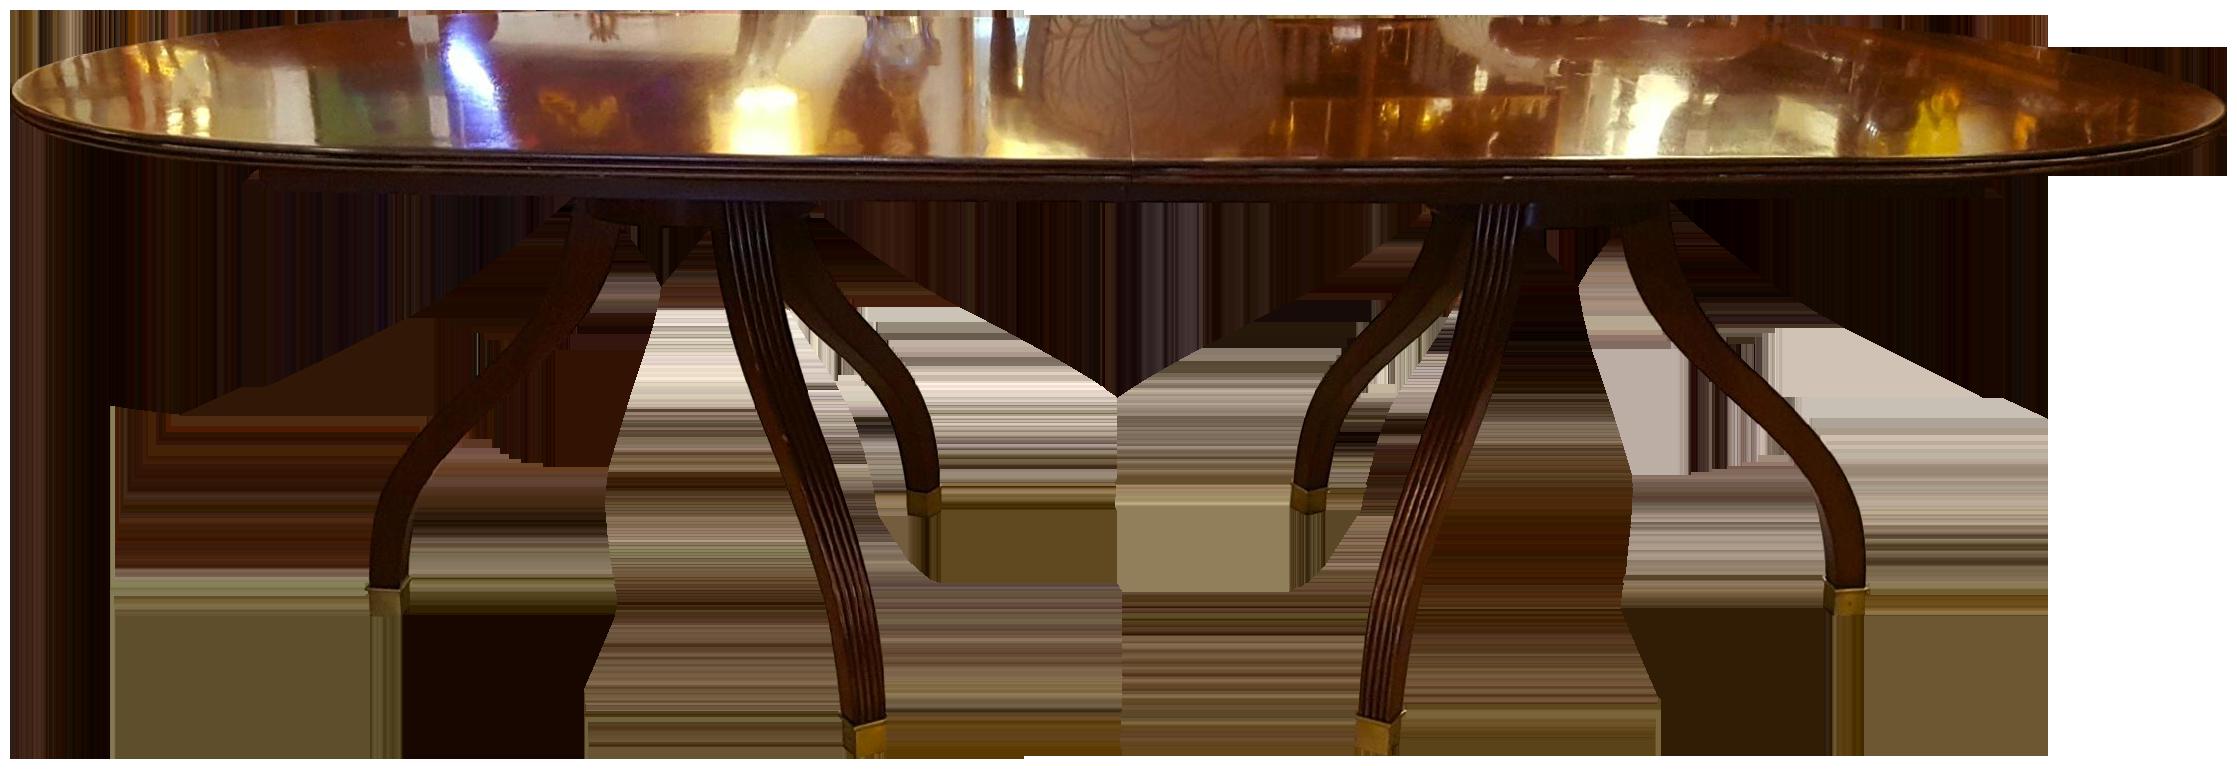 traditional ralph lauren mahogany dining table chairish ralp